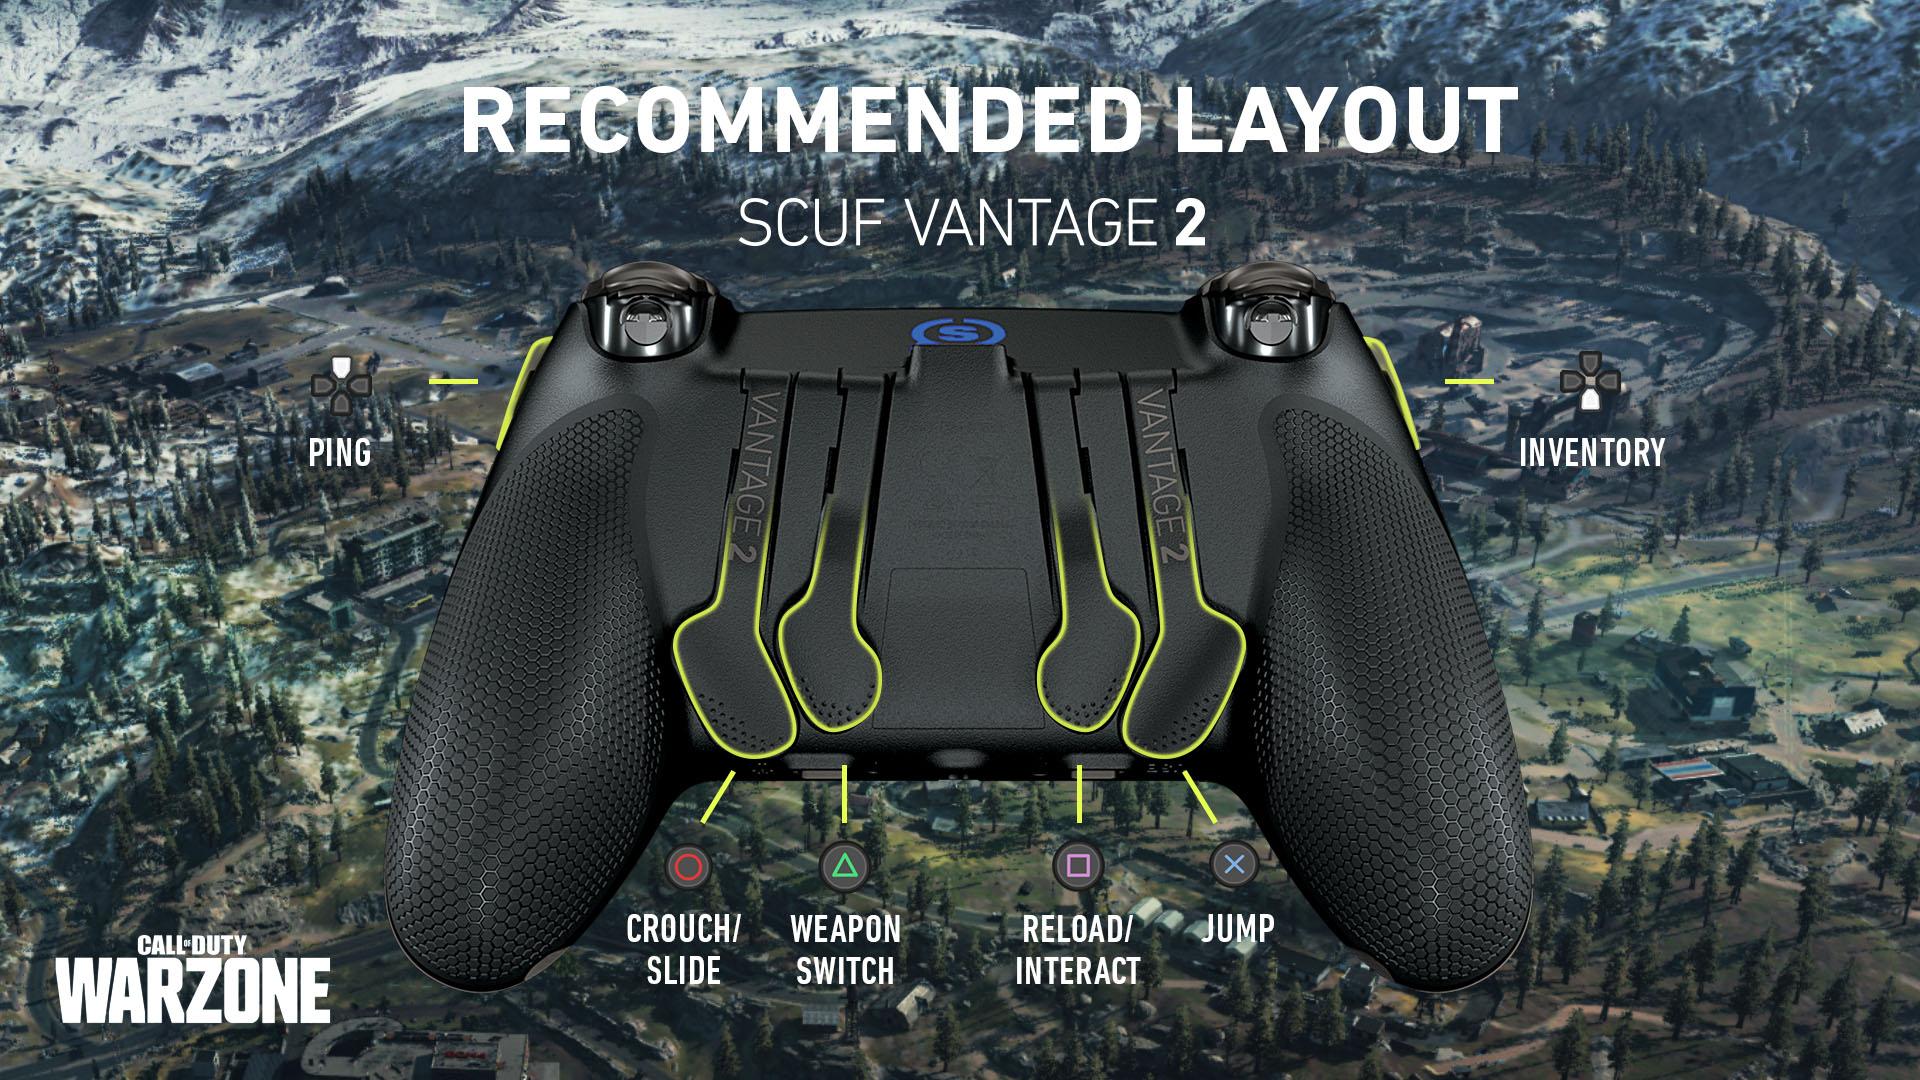 SCUF Vantage 2 COD Warzone PS4 Controller